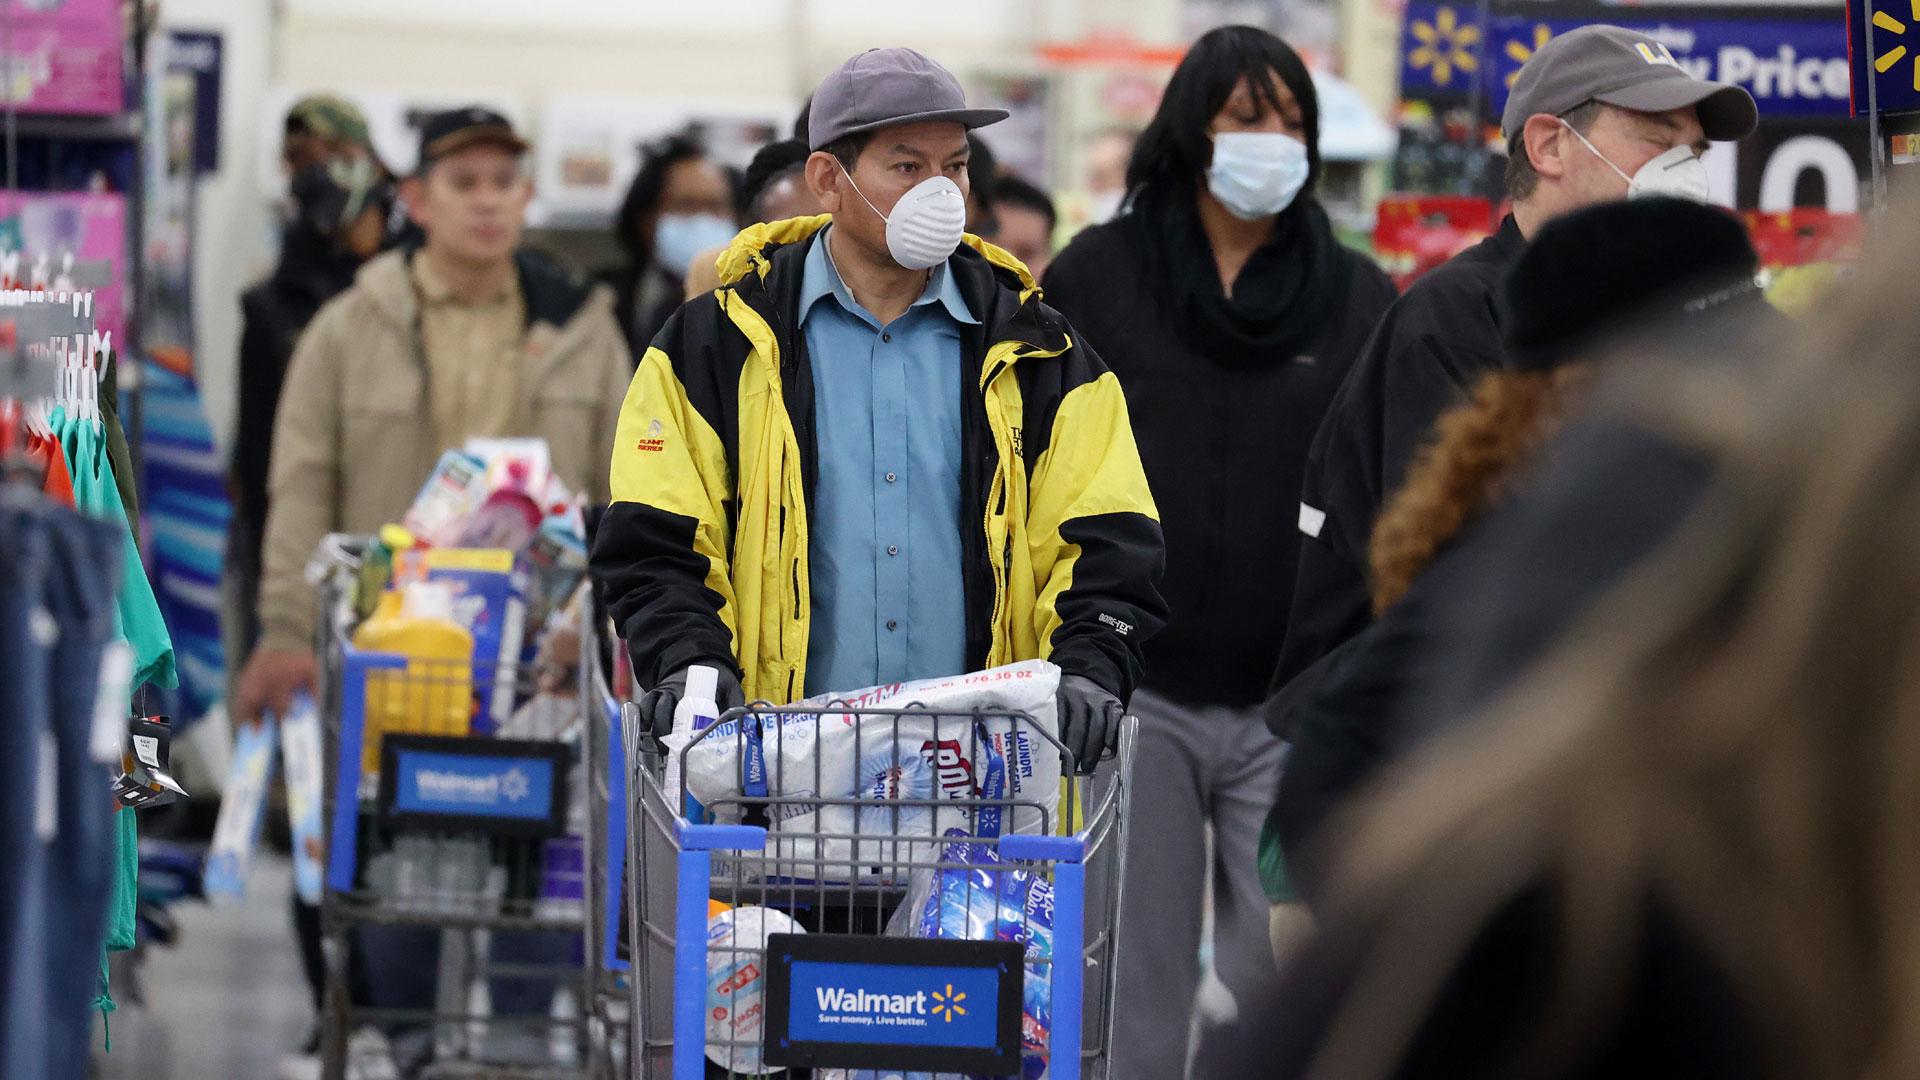 Walmart shoppers, coronavirus